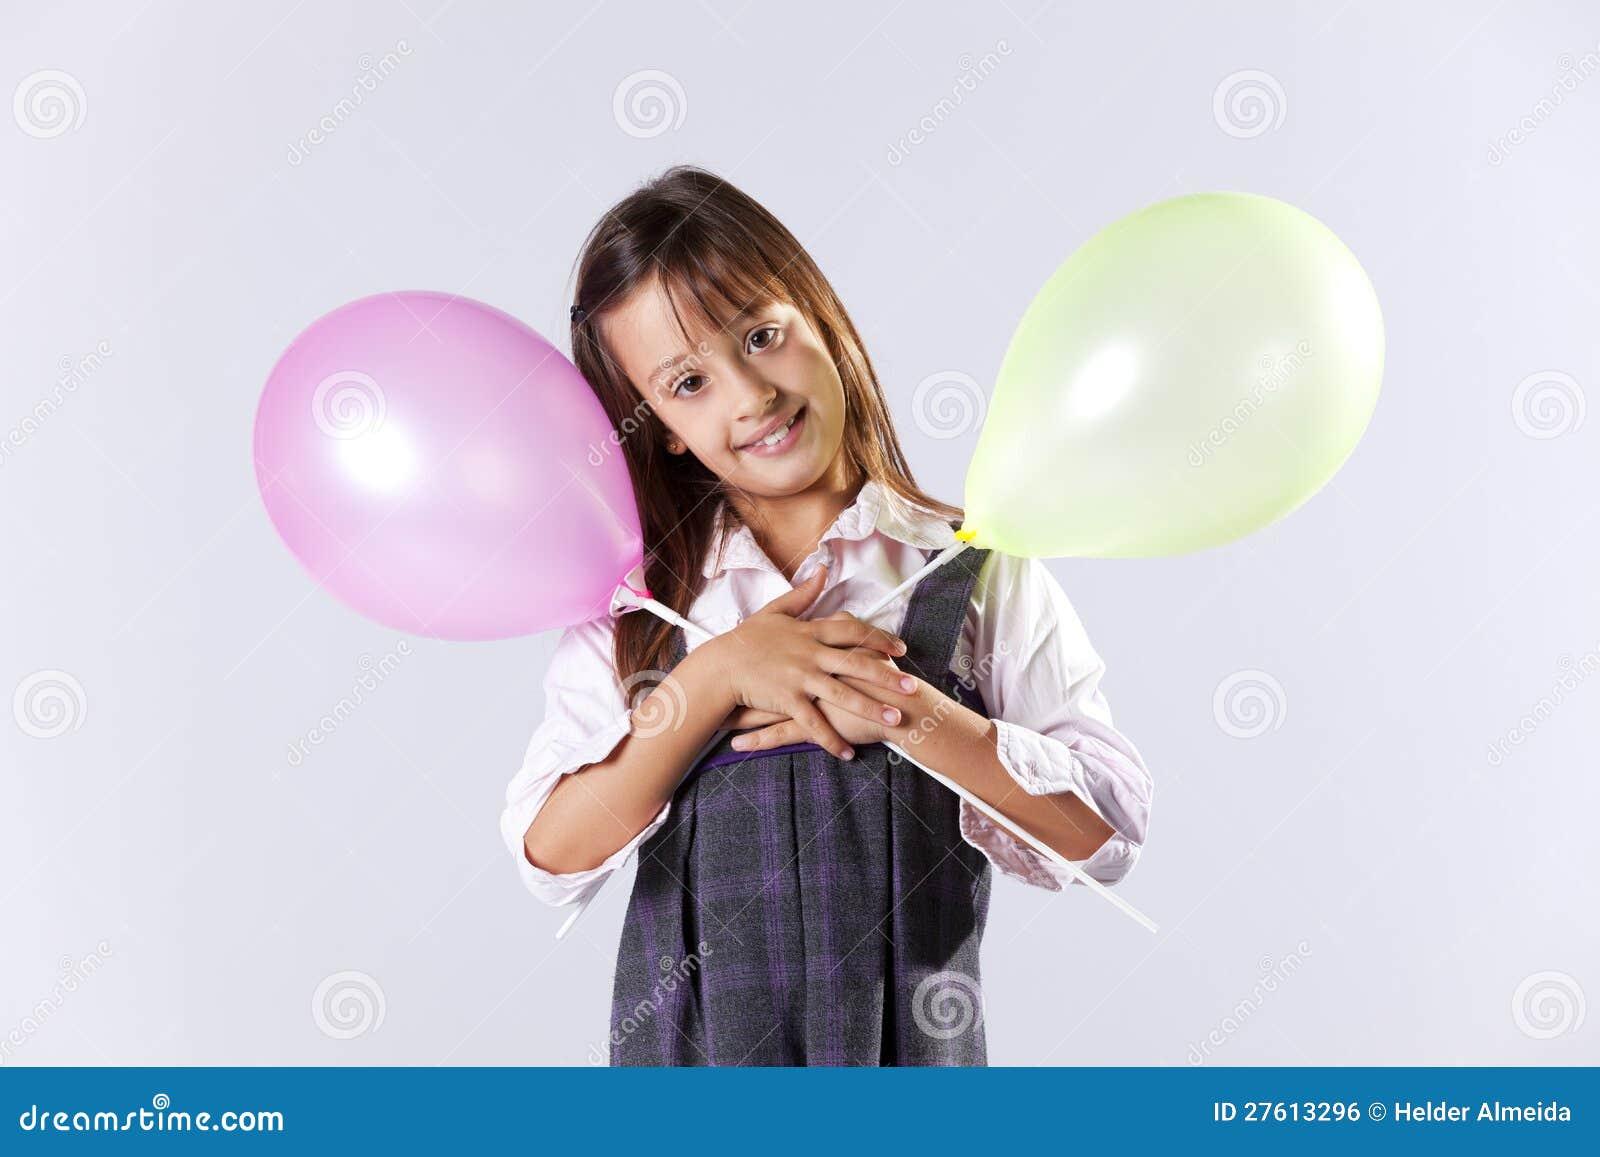 Little girl holding color ballons